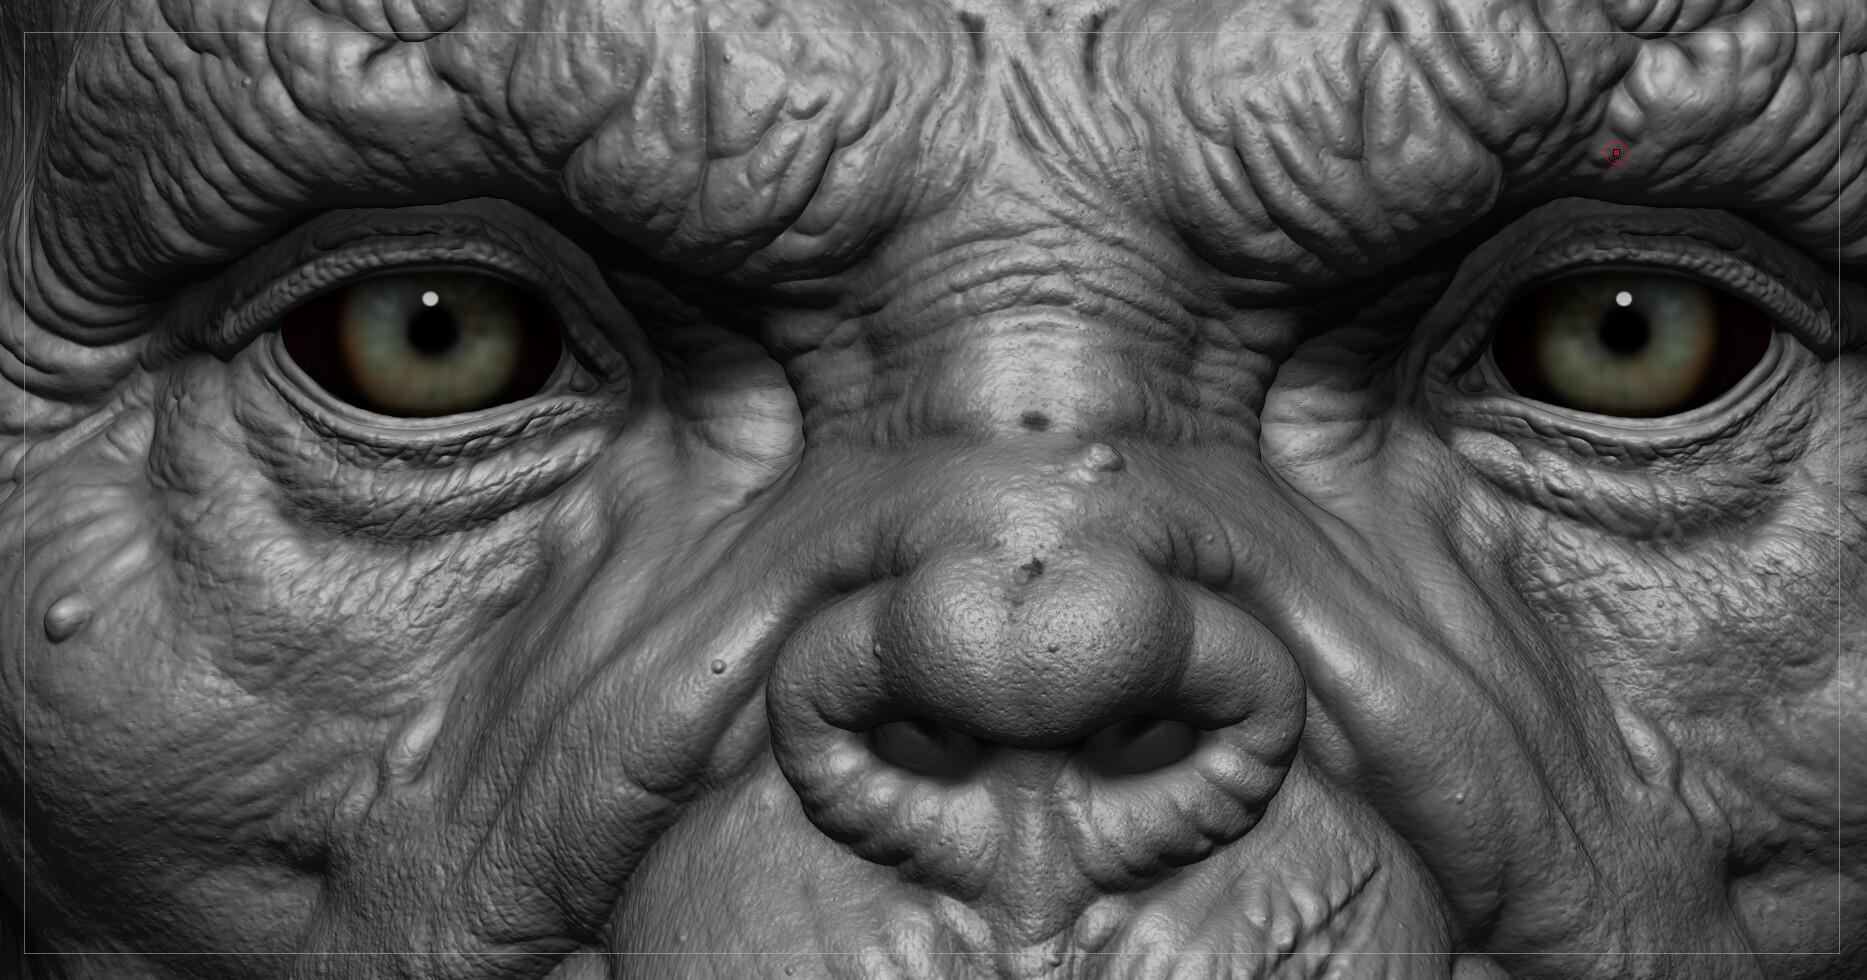 Chingiz jumagulov monster progress17